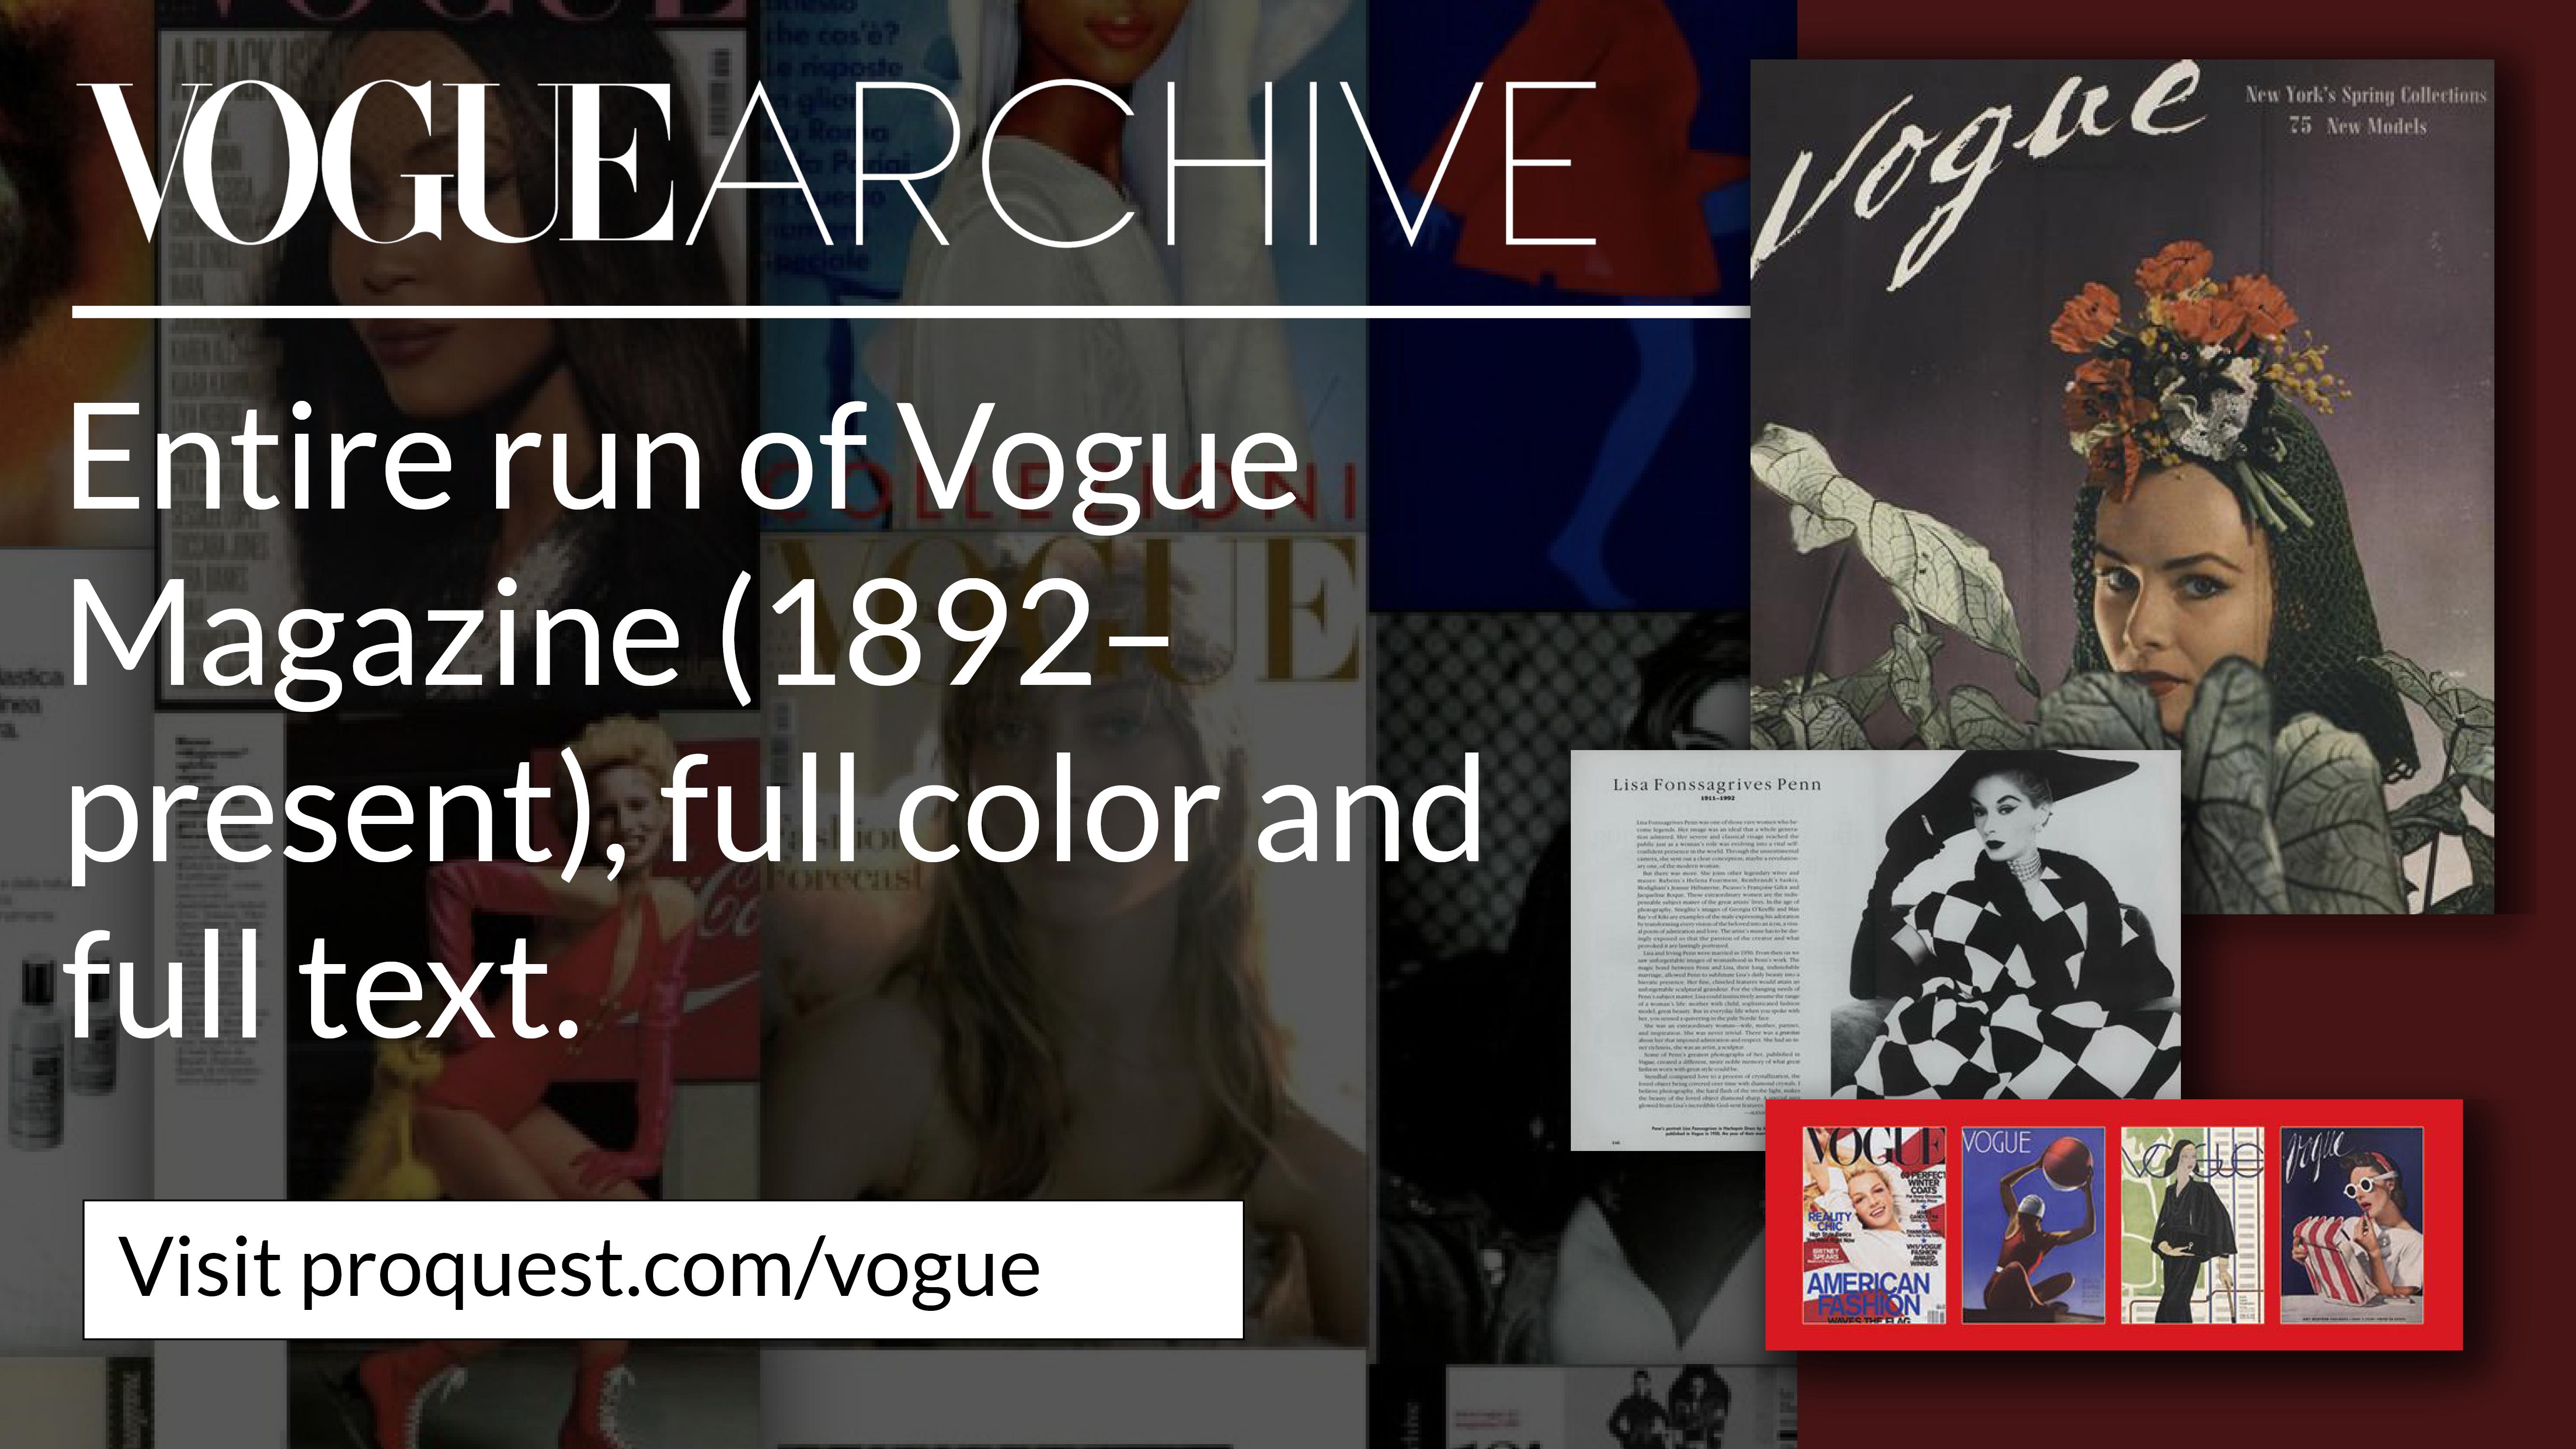 Vogue Archive, Entire run of Vogue Magazine (1892–present), full color and full text. Visit proquest.com/vogue